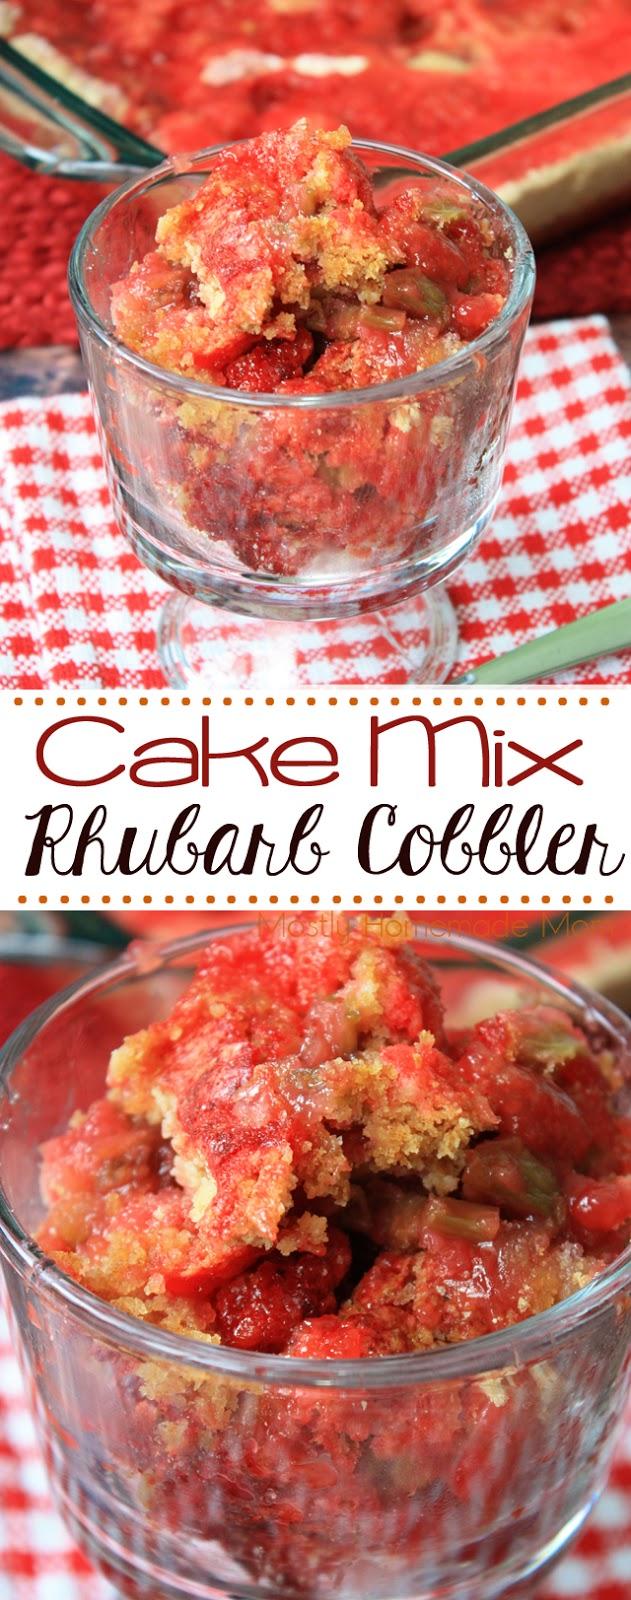 rhubarb cobbler recipe